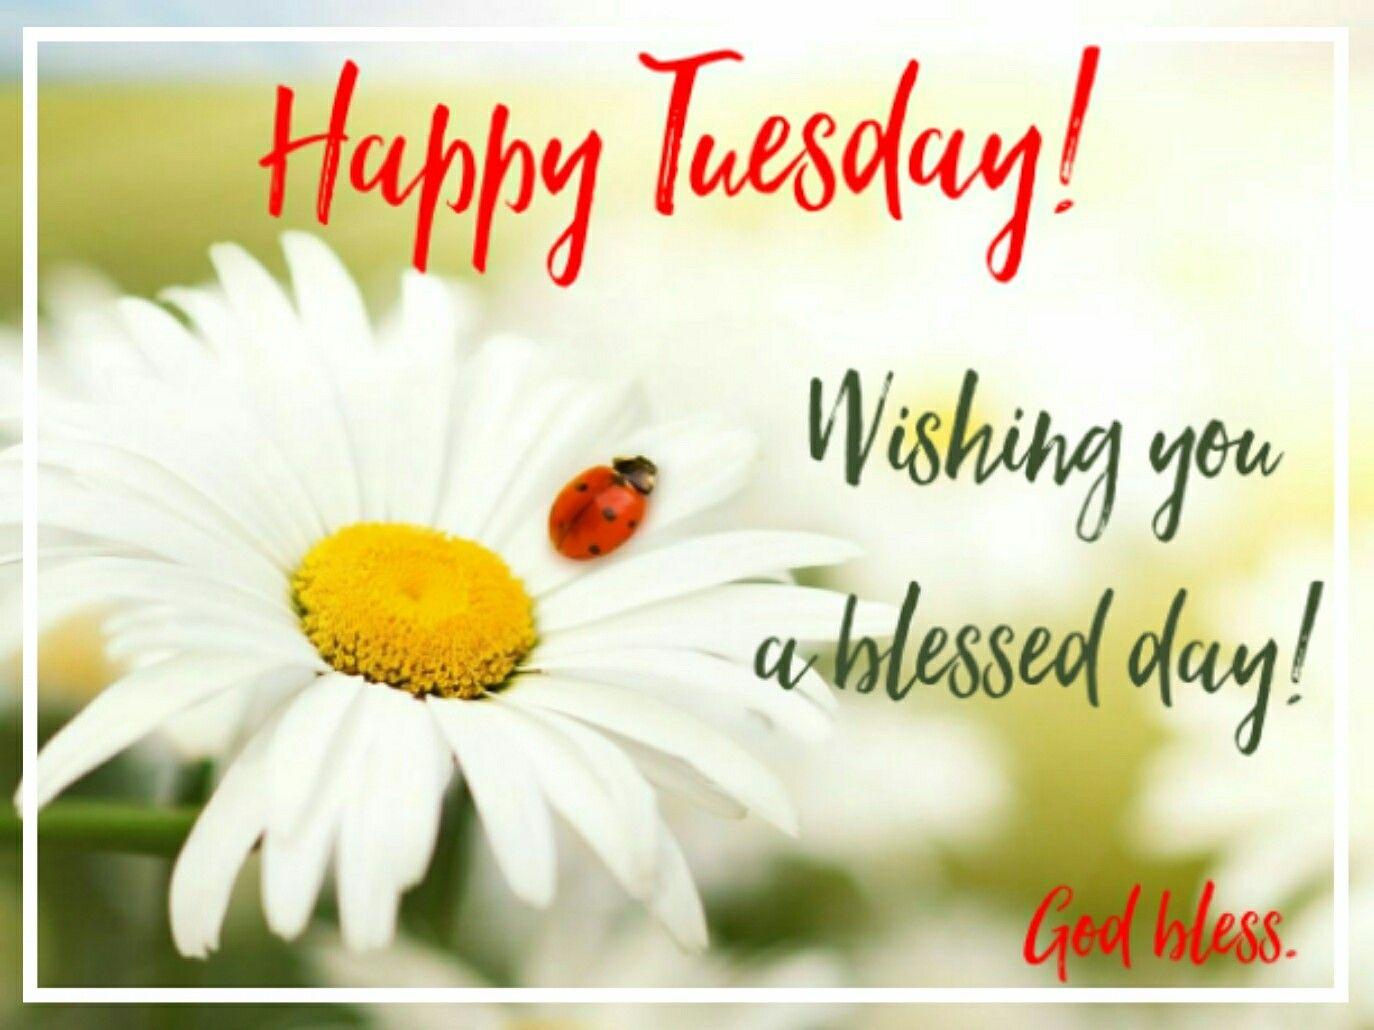 Good Morning Happy Tuesday Goodmorning Goodmorningpost Good Morningpost Morning Workgrind Gm Wor Good Morning Tuesday Morning Blessings Happy Tuesday